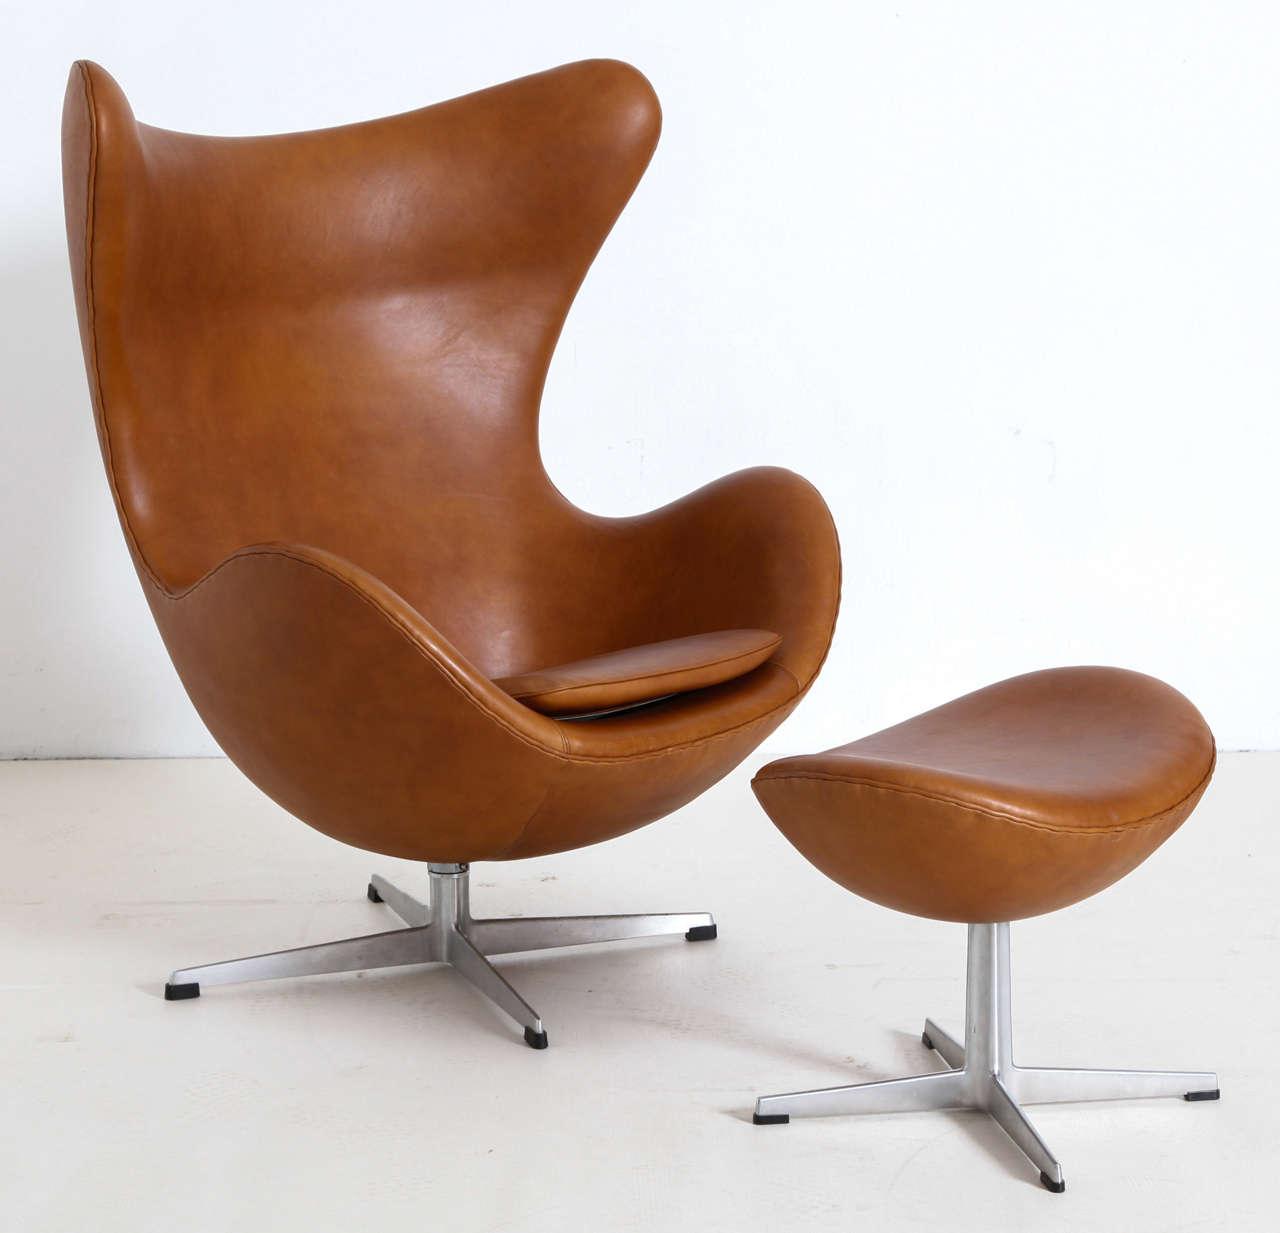 arne jacobsen egg chair with ottoman at 1stdibs. Black Bedroom Furniture Sets. Home Design Ideas